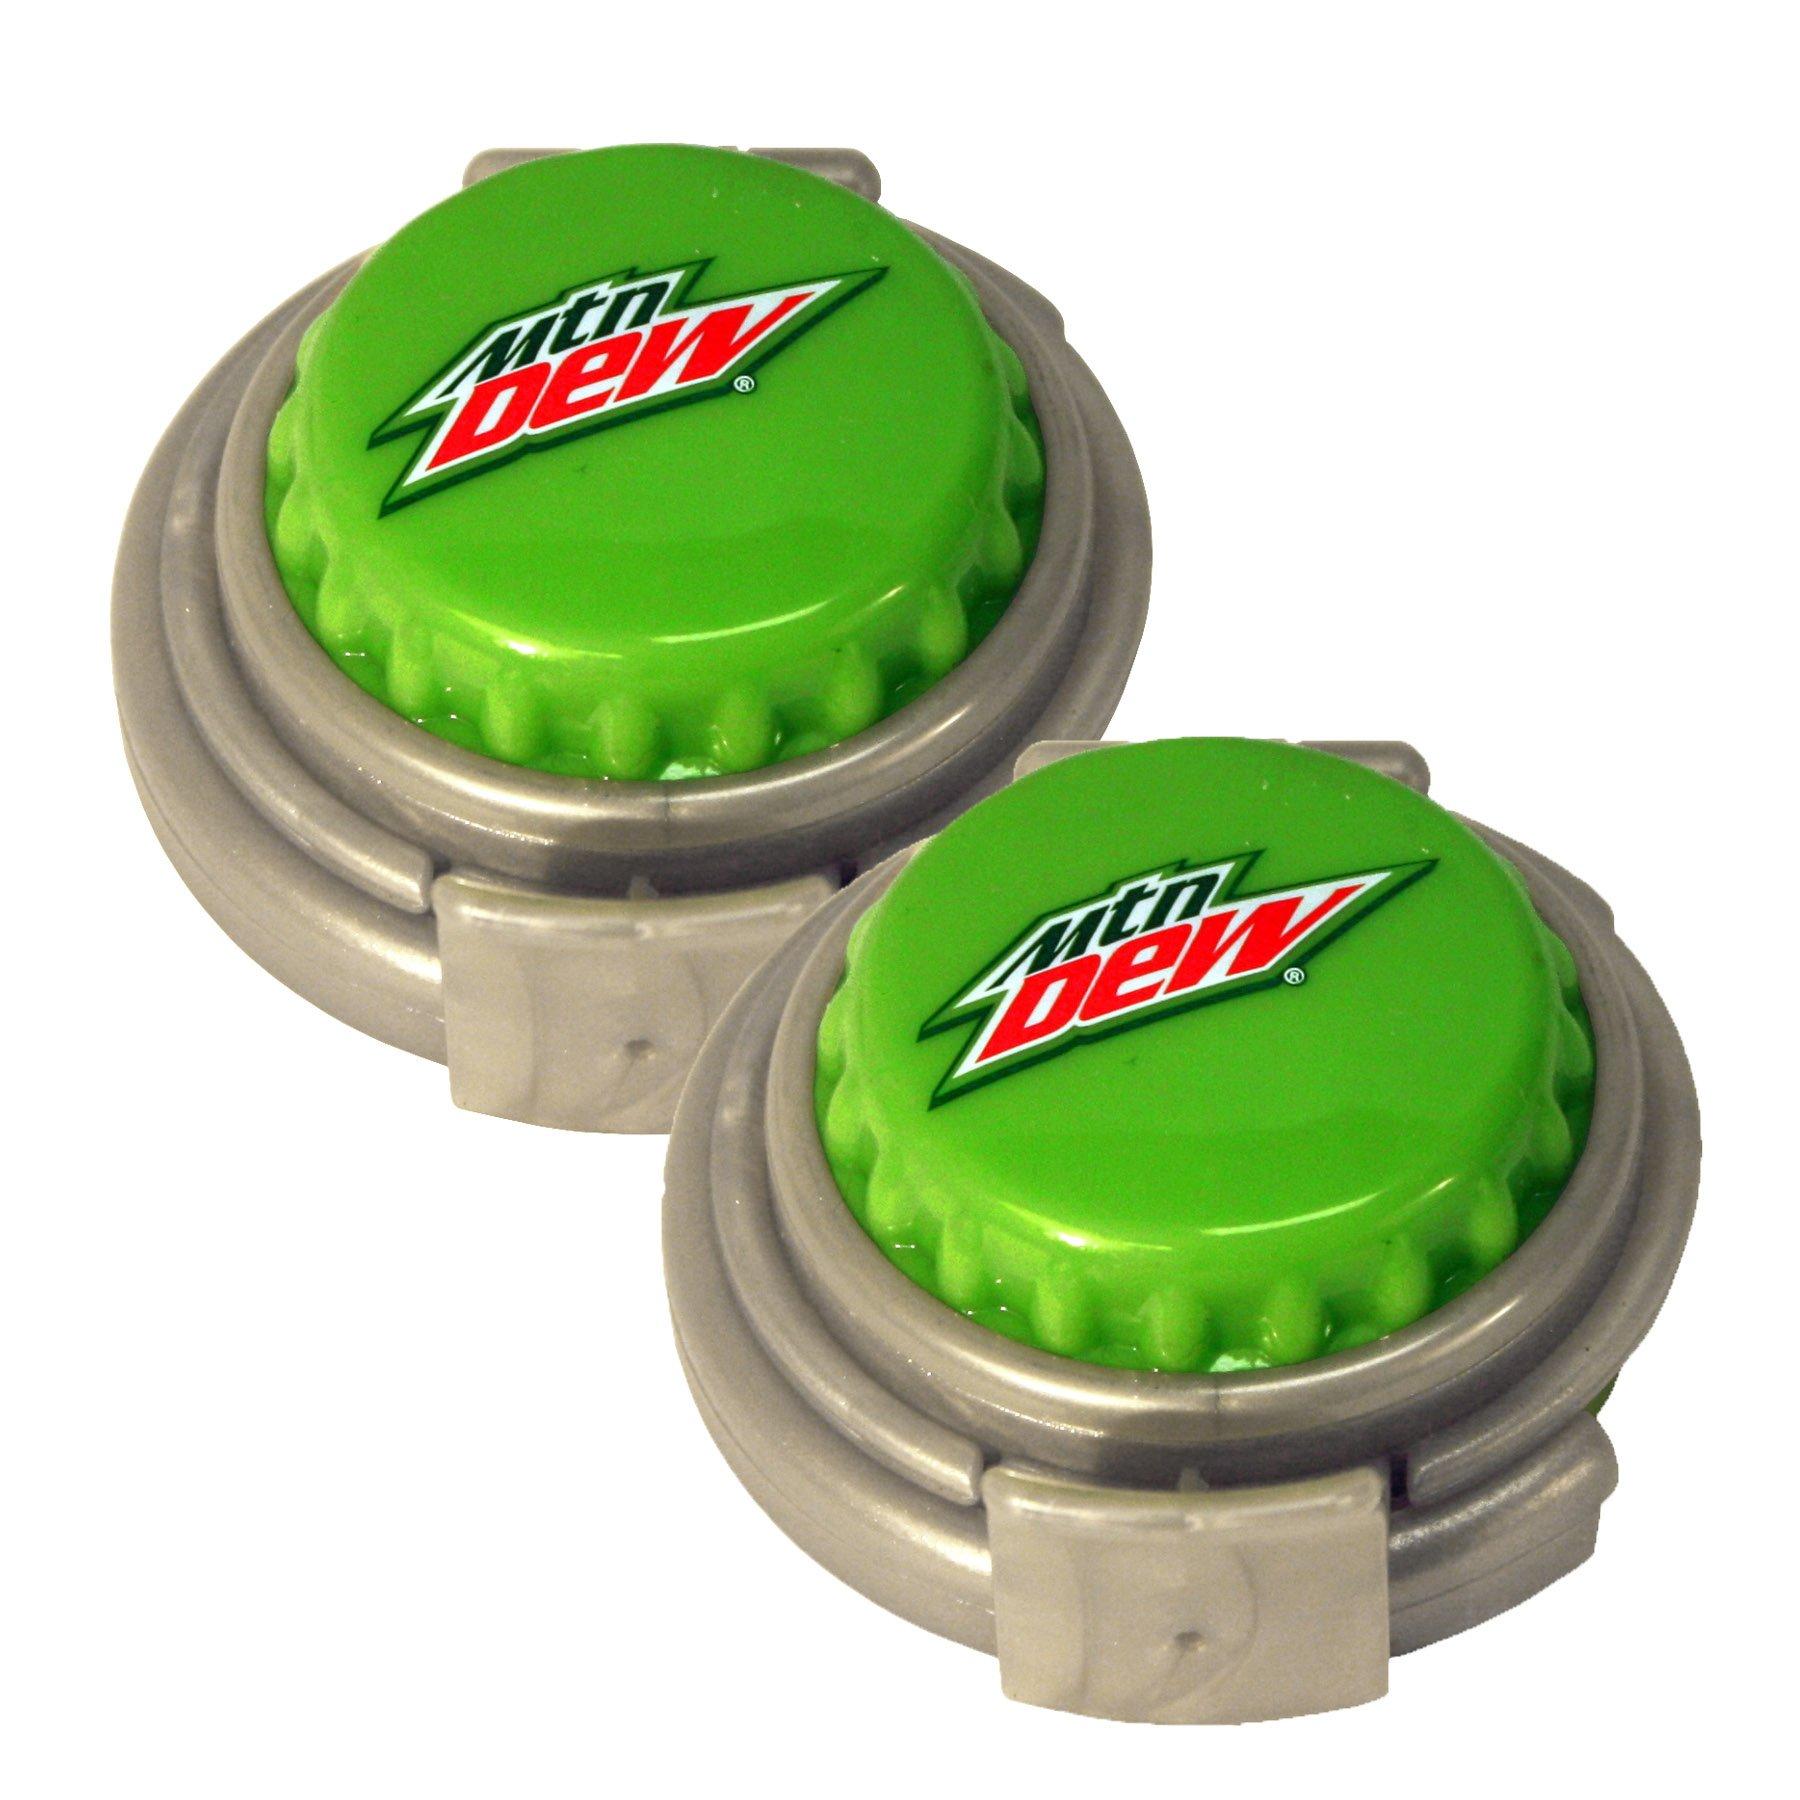 Jokari 2 Count Mtn Dew Modern Logo Soda Can Pump and Pour Caps, Green